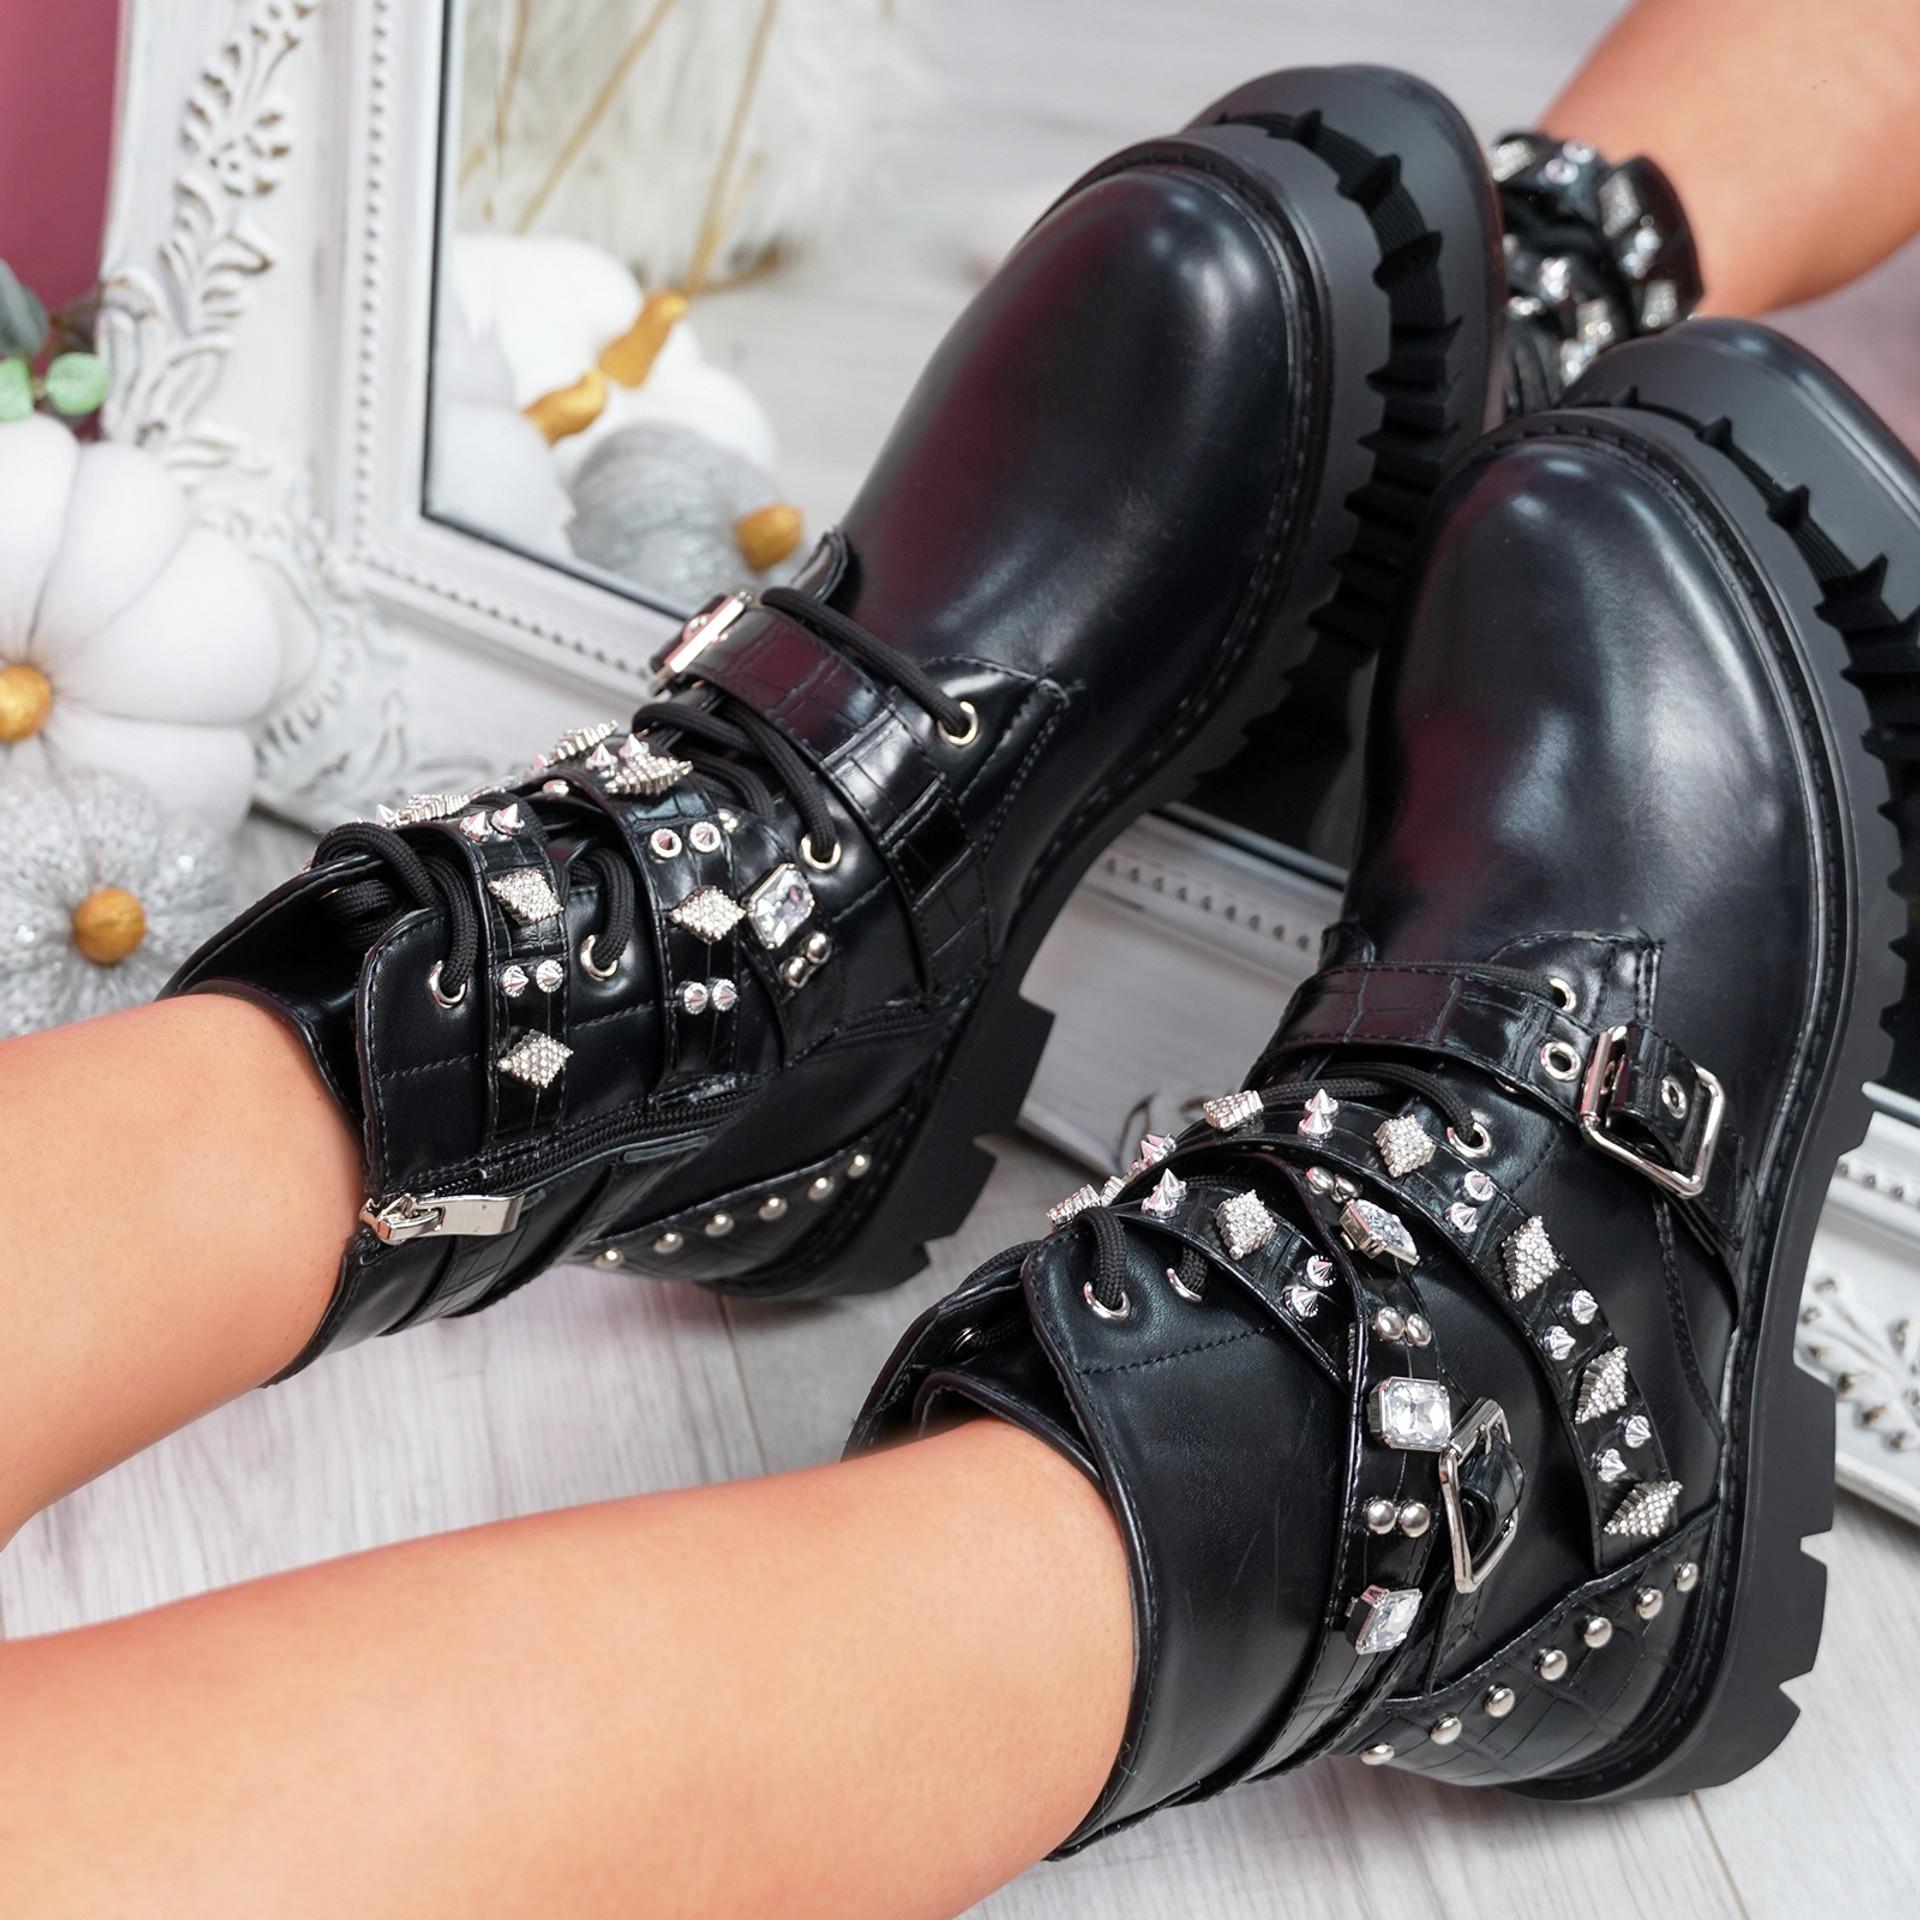 Zegga Black Studded Ankle Boots